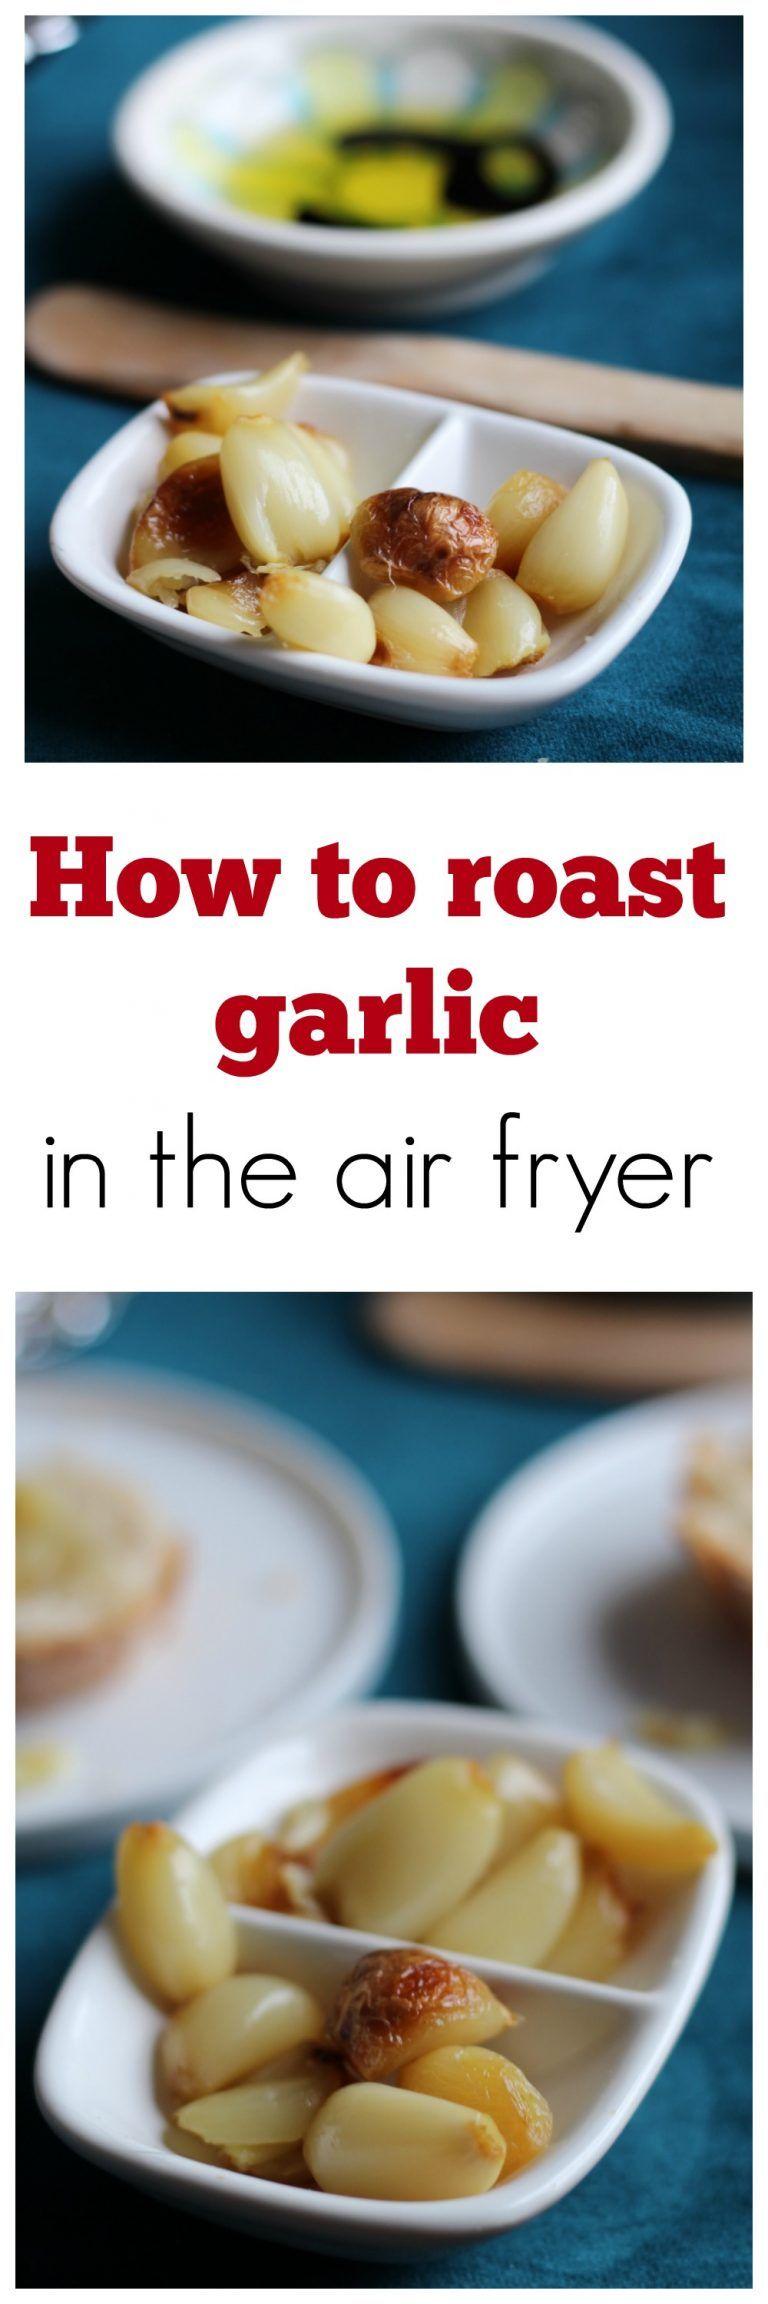 Roasted garlic air fryer Recipe Air fryer recipes